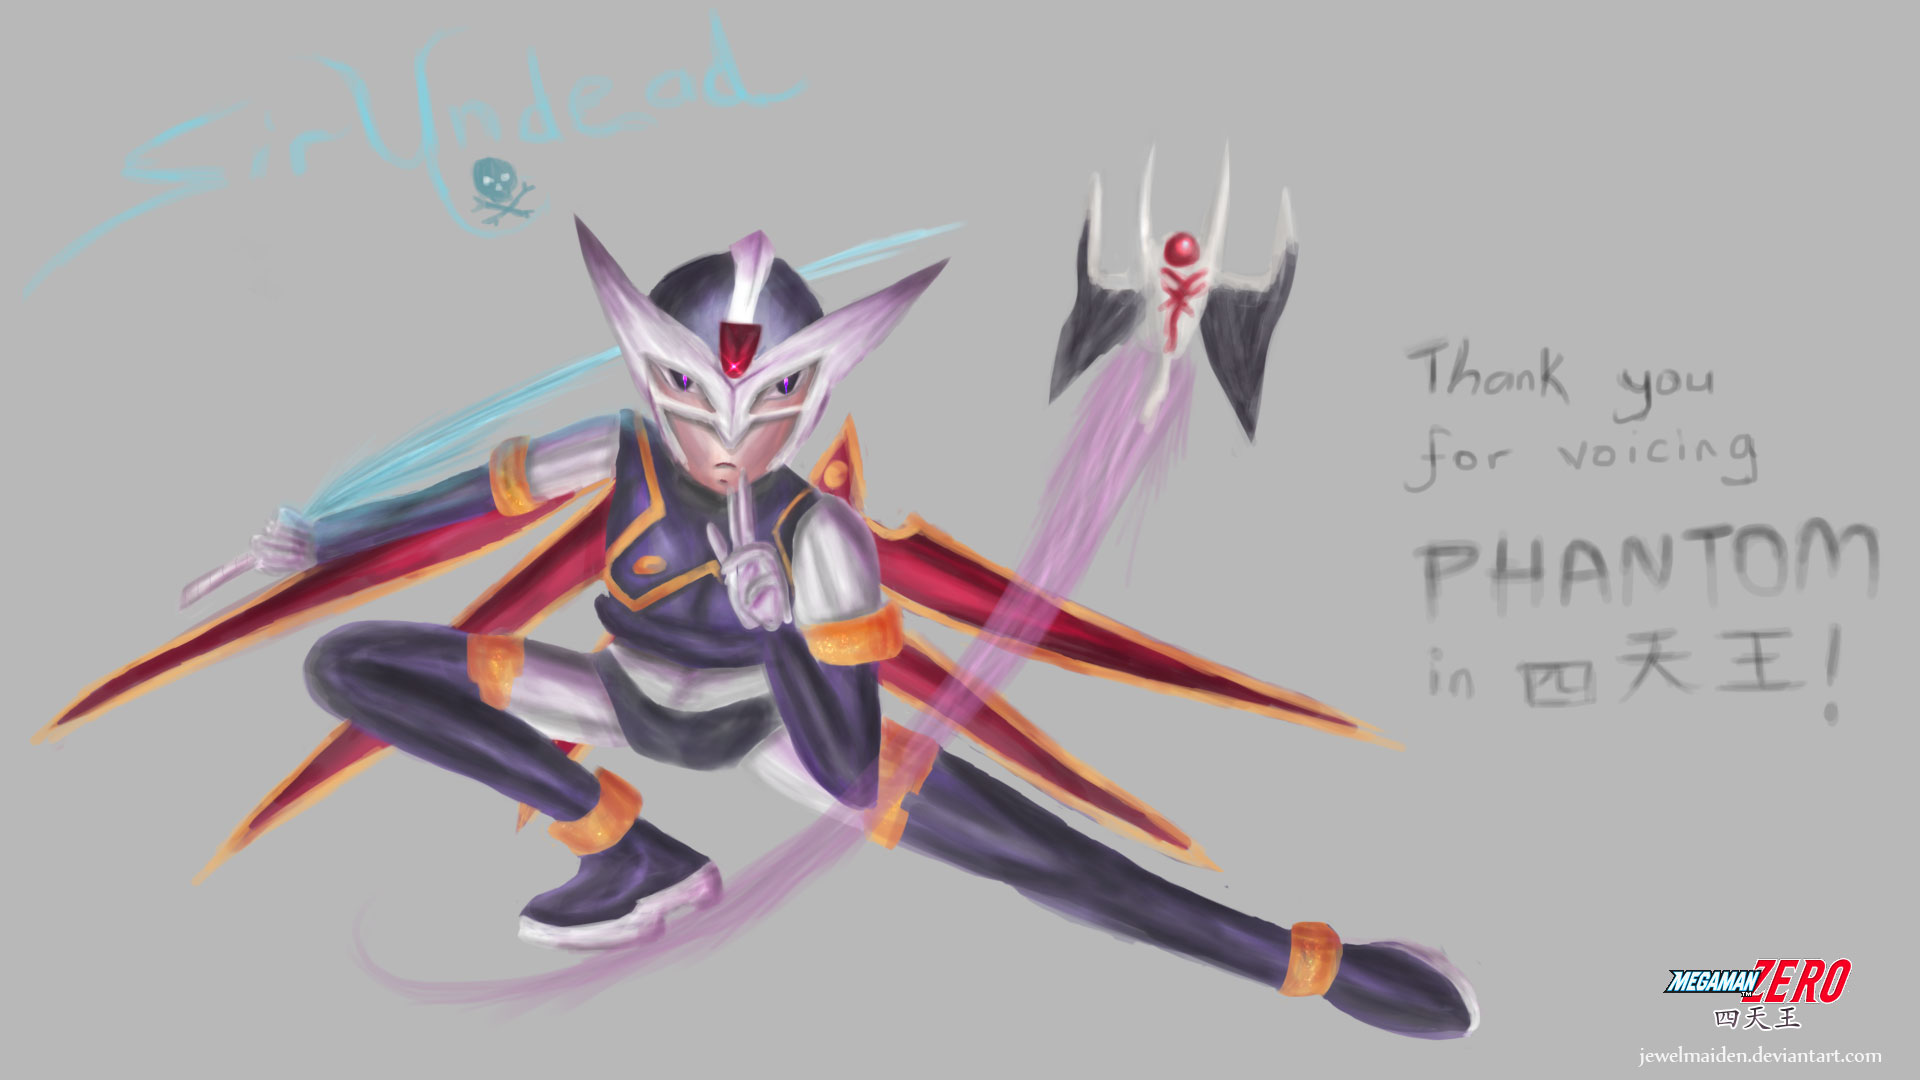 Megaman Zero Phantom